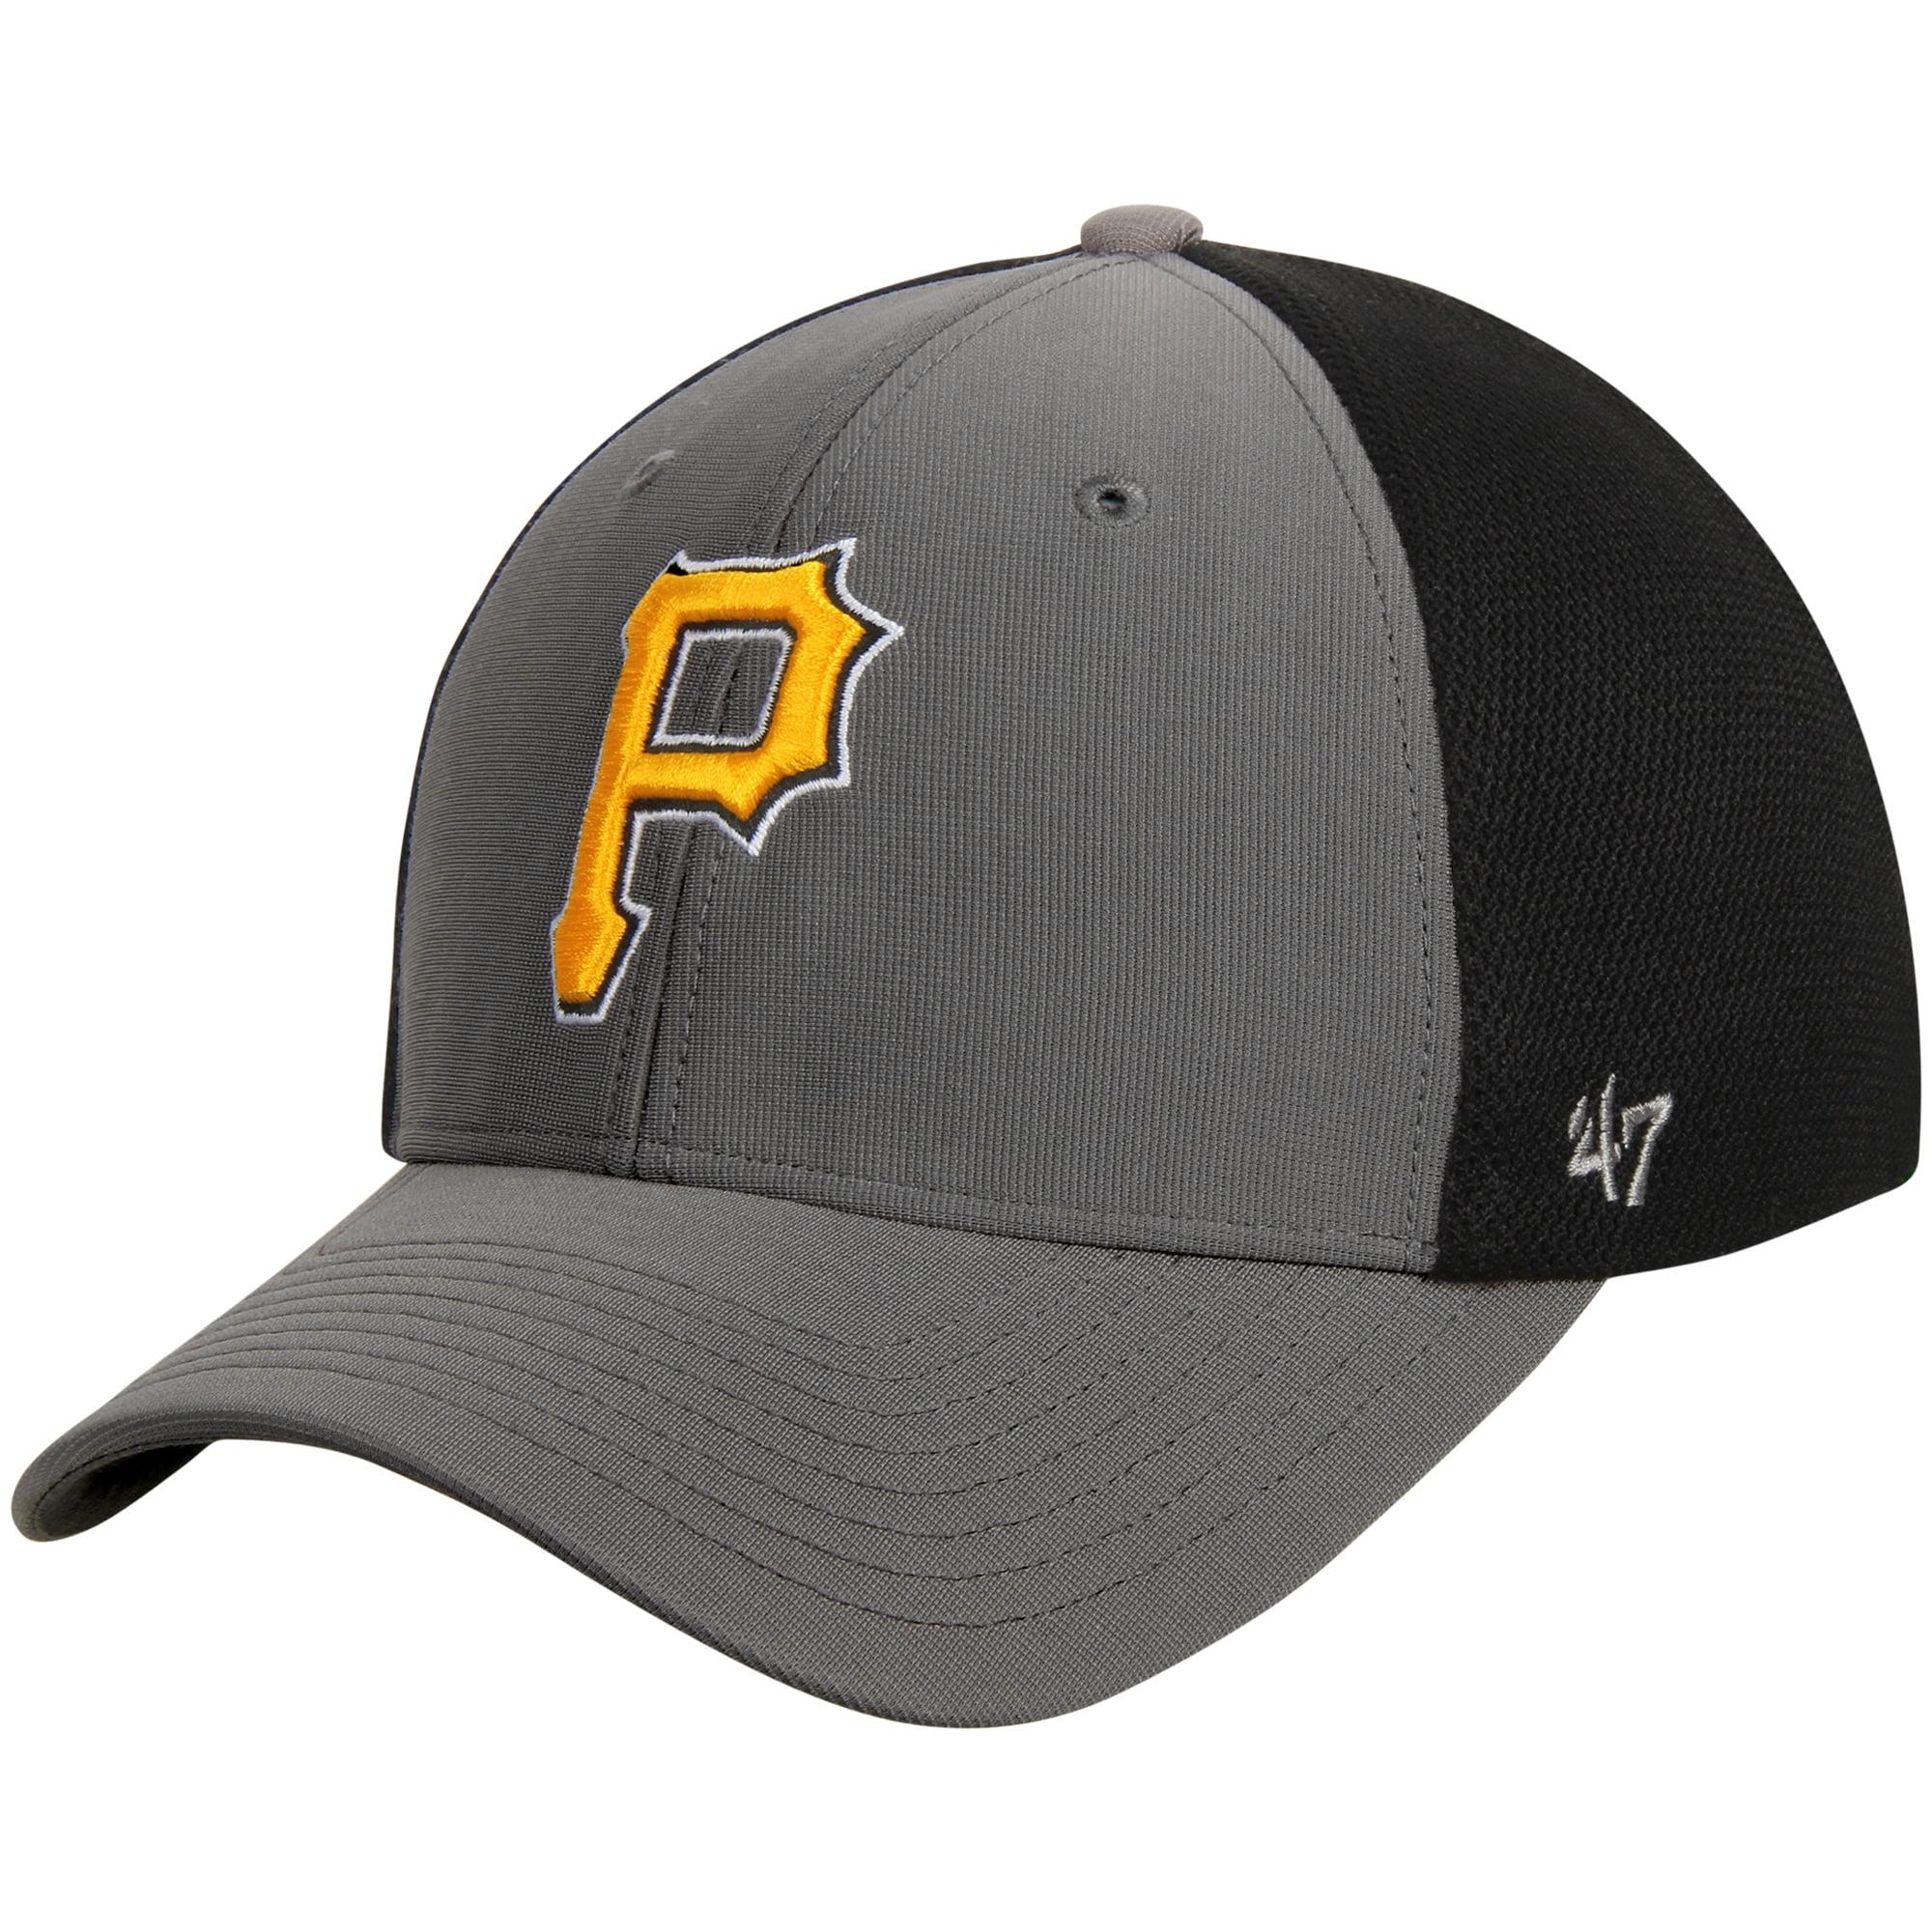 Pittsburgh Pirates '47 Talis MVP Adjustable Hat - Dark Gray/Black - OSFA